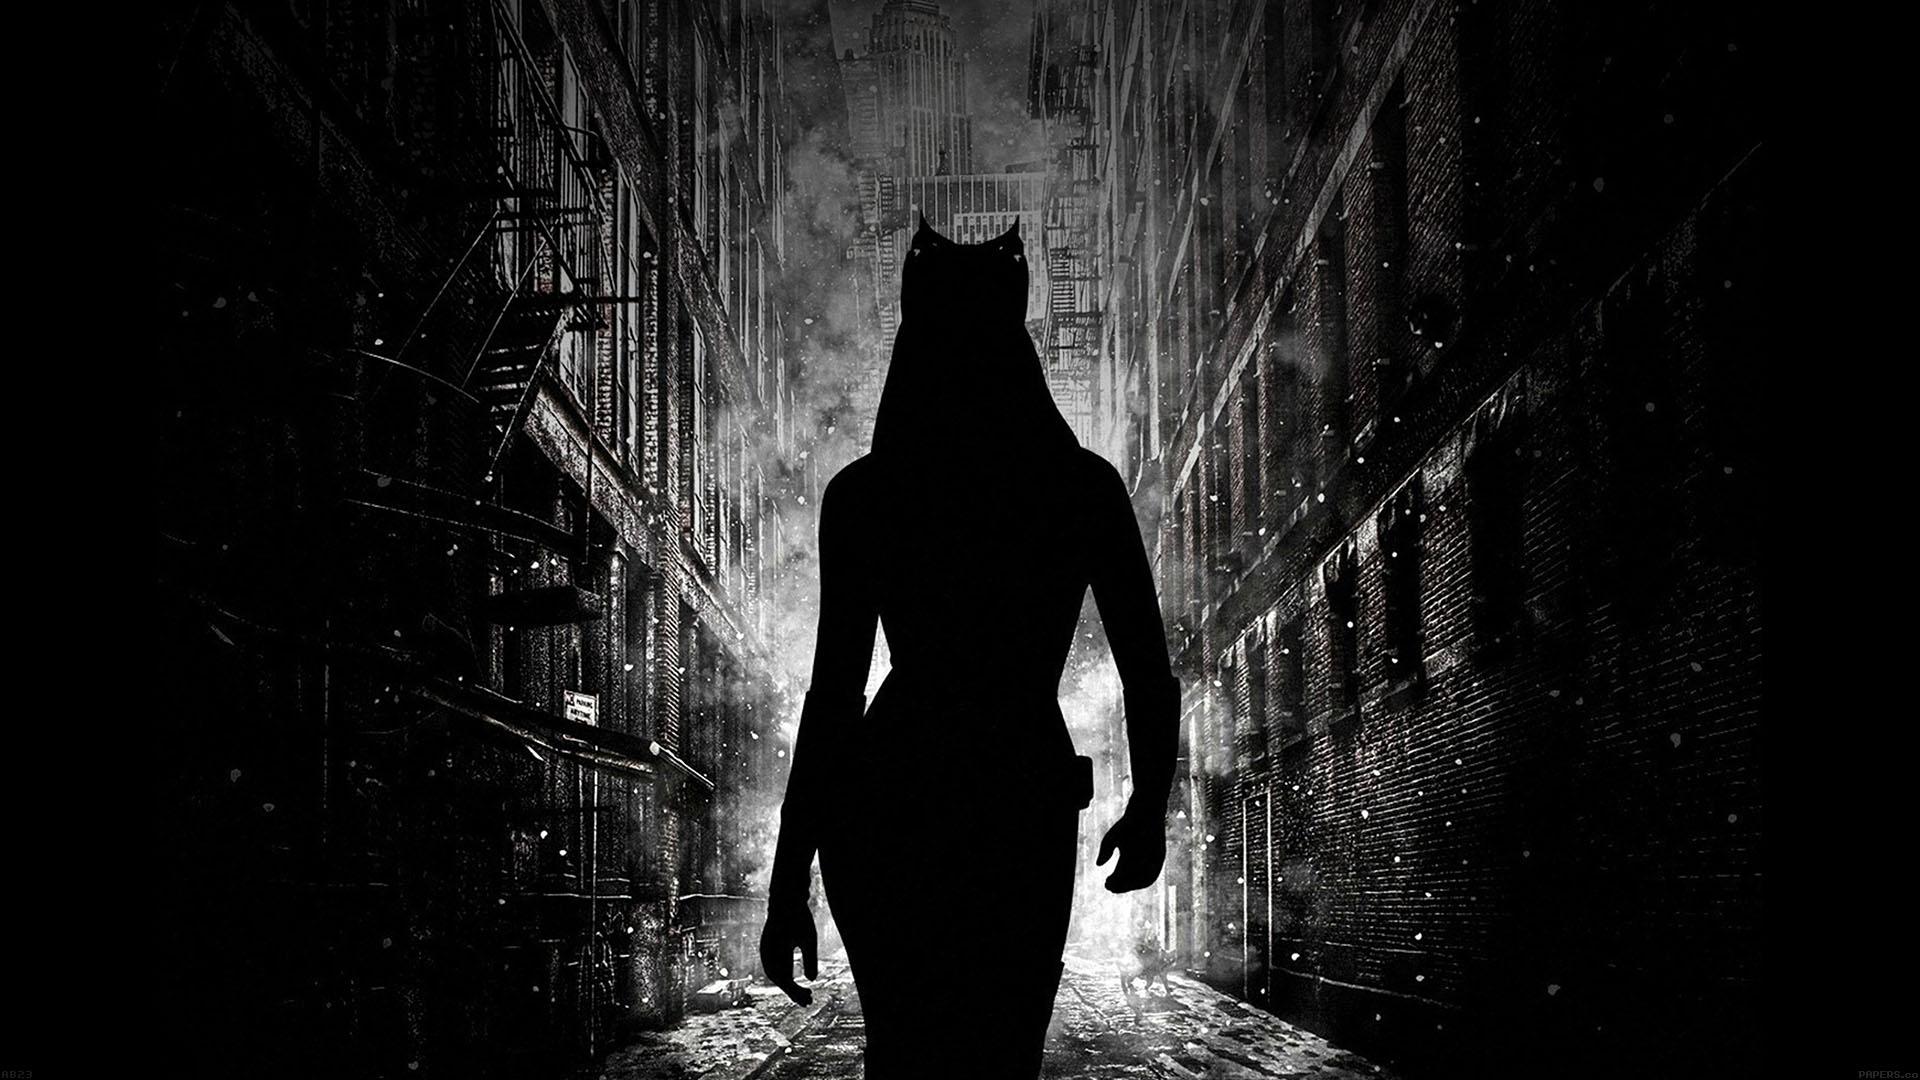 Black Cat Fall Wallpaper Ab23 Wallpaper Catwoman Walking Dark Papers Co